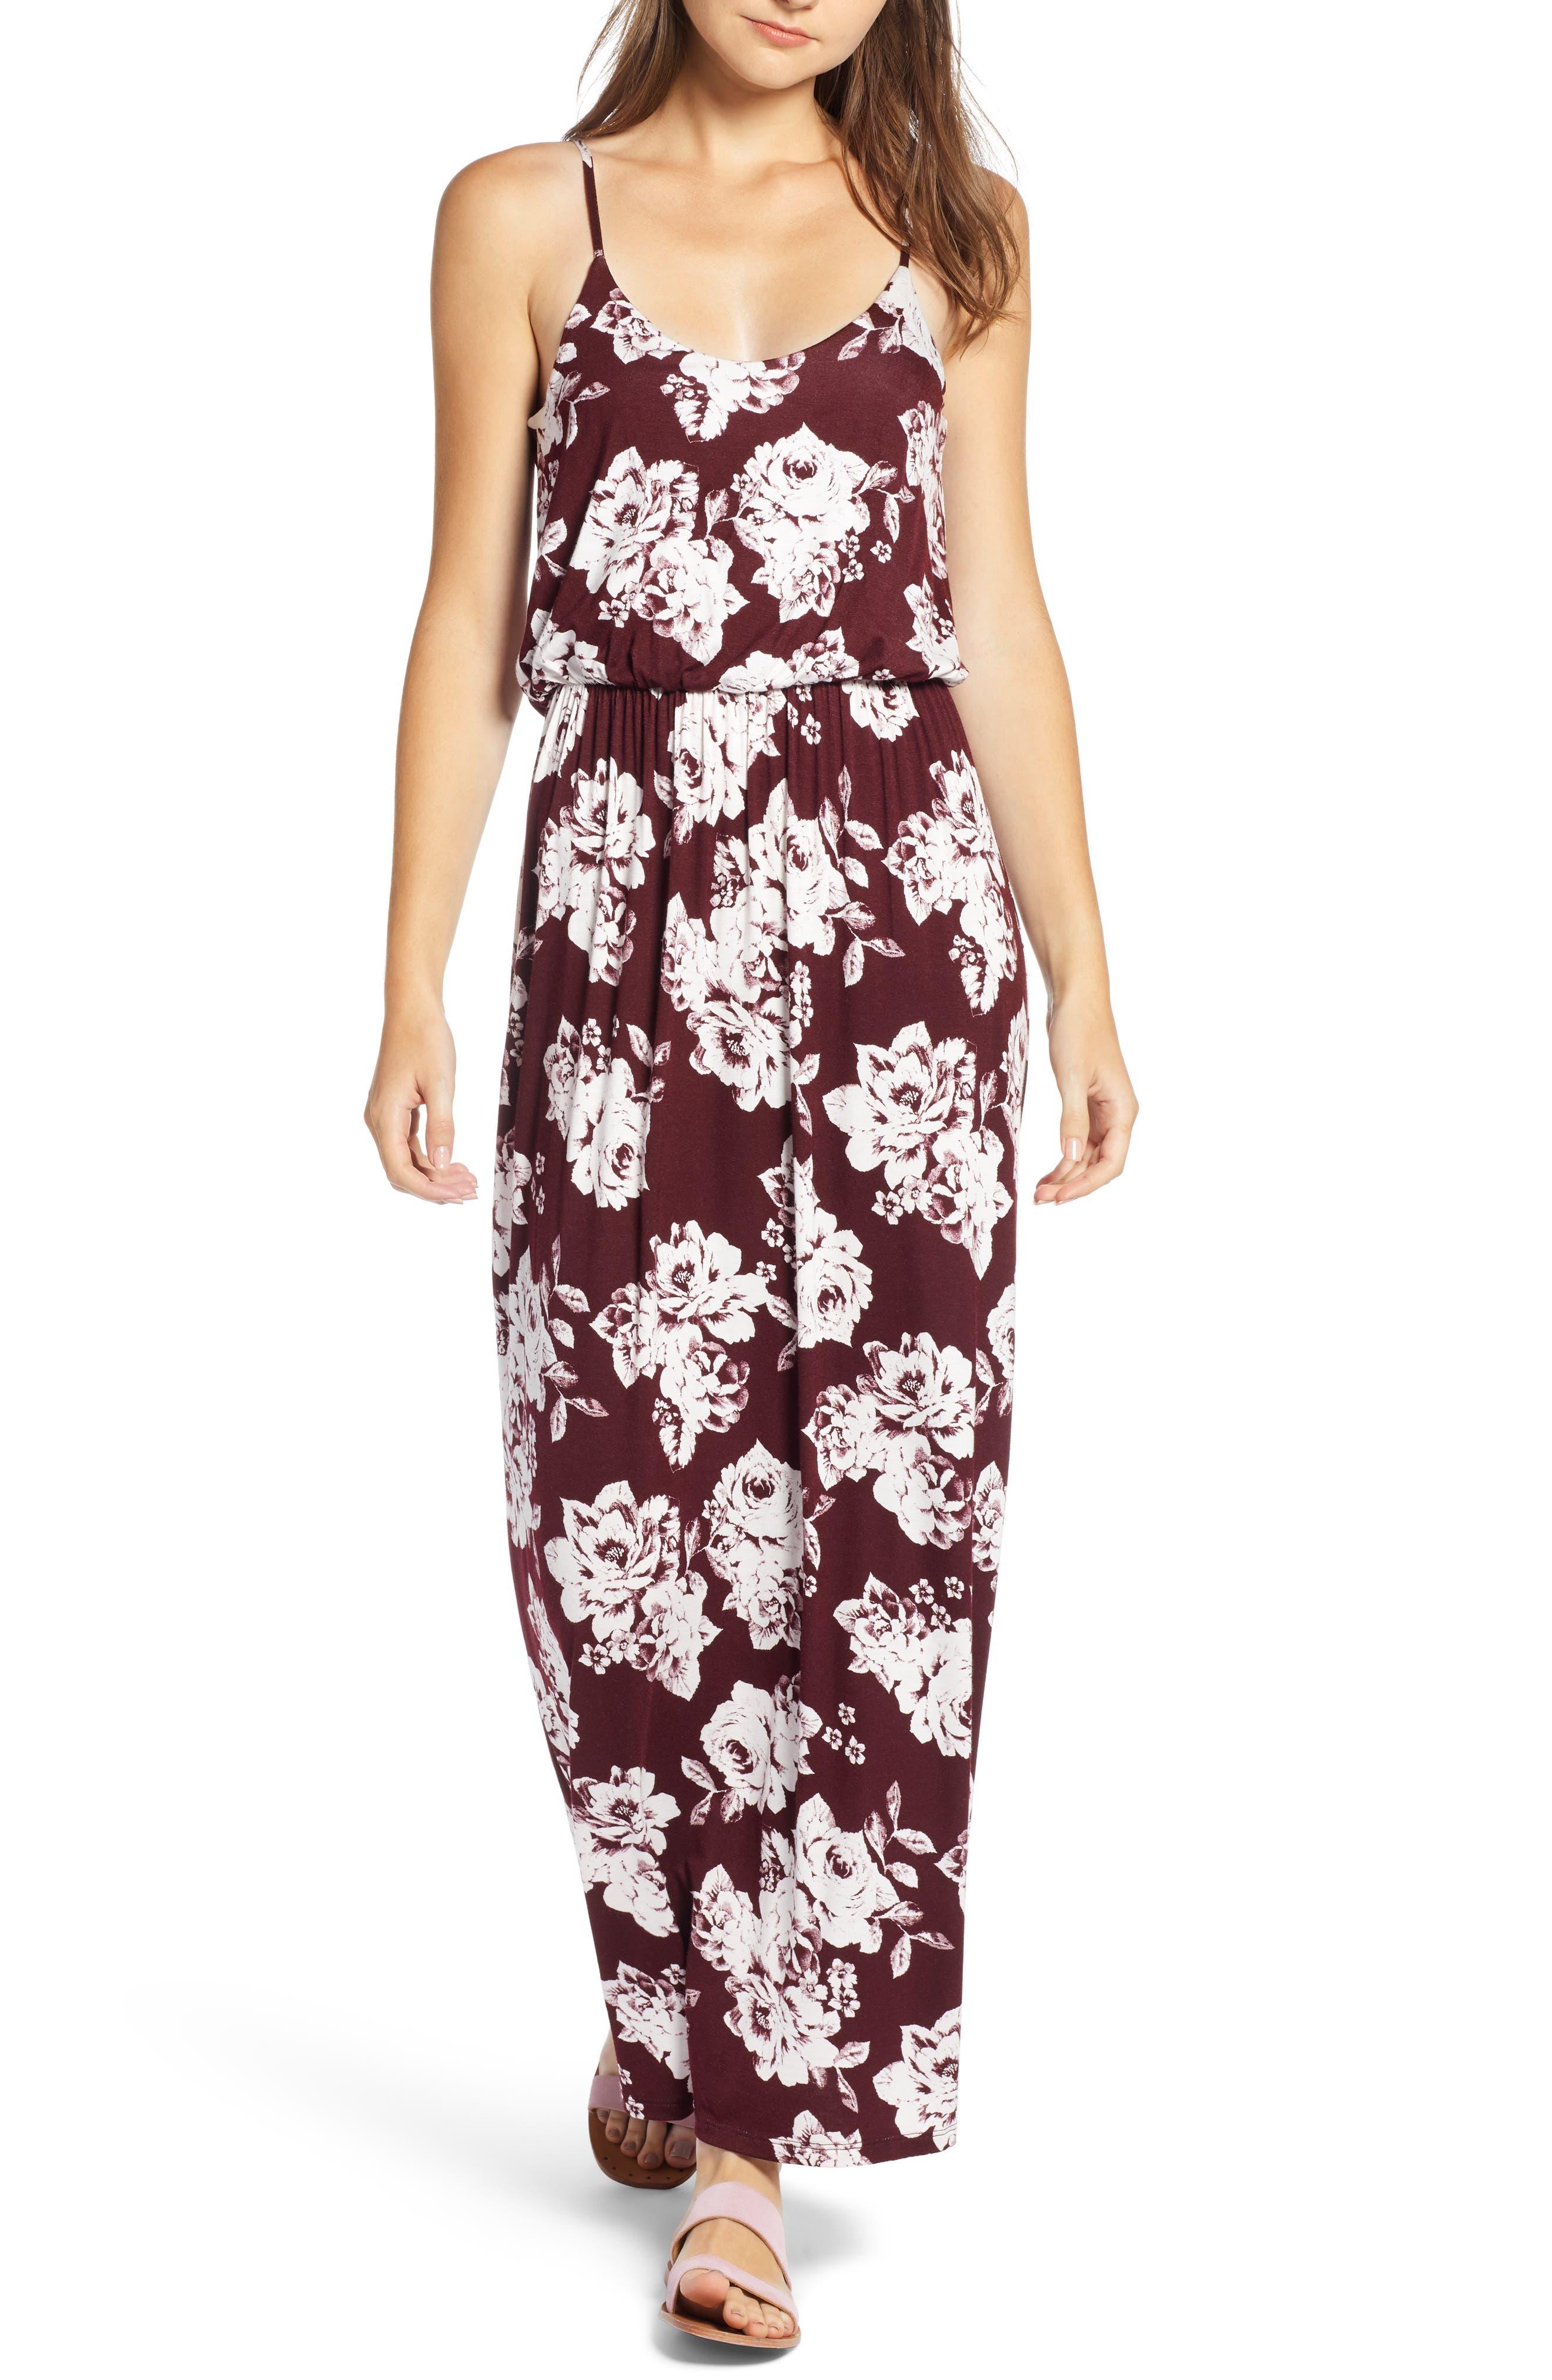 Knit Maxi Dress,                         Main,                         color, BURGUNDY FLORAL